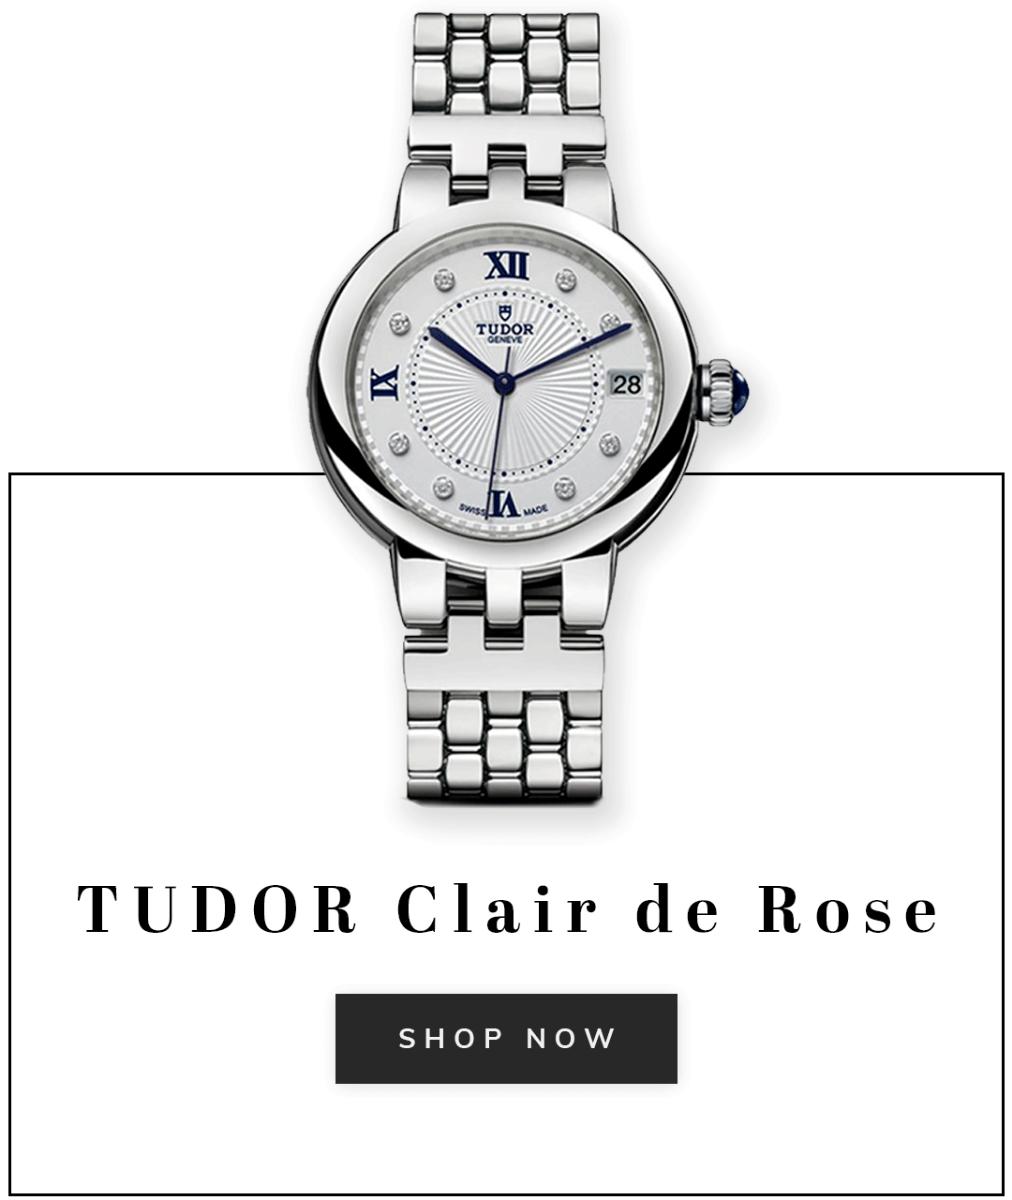 A Tudor Clair de Rose watch with text shop now